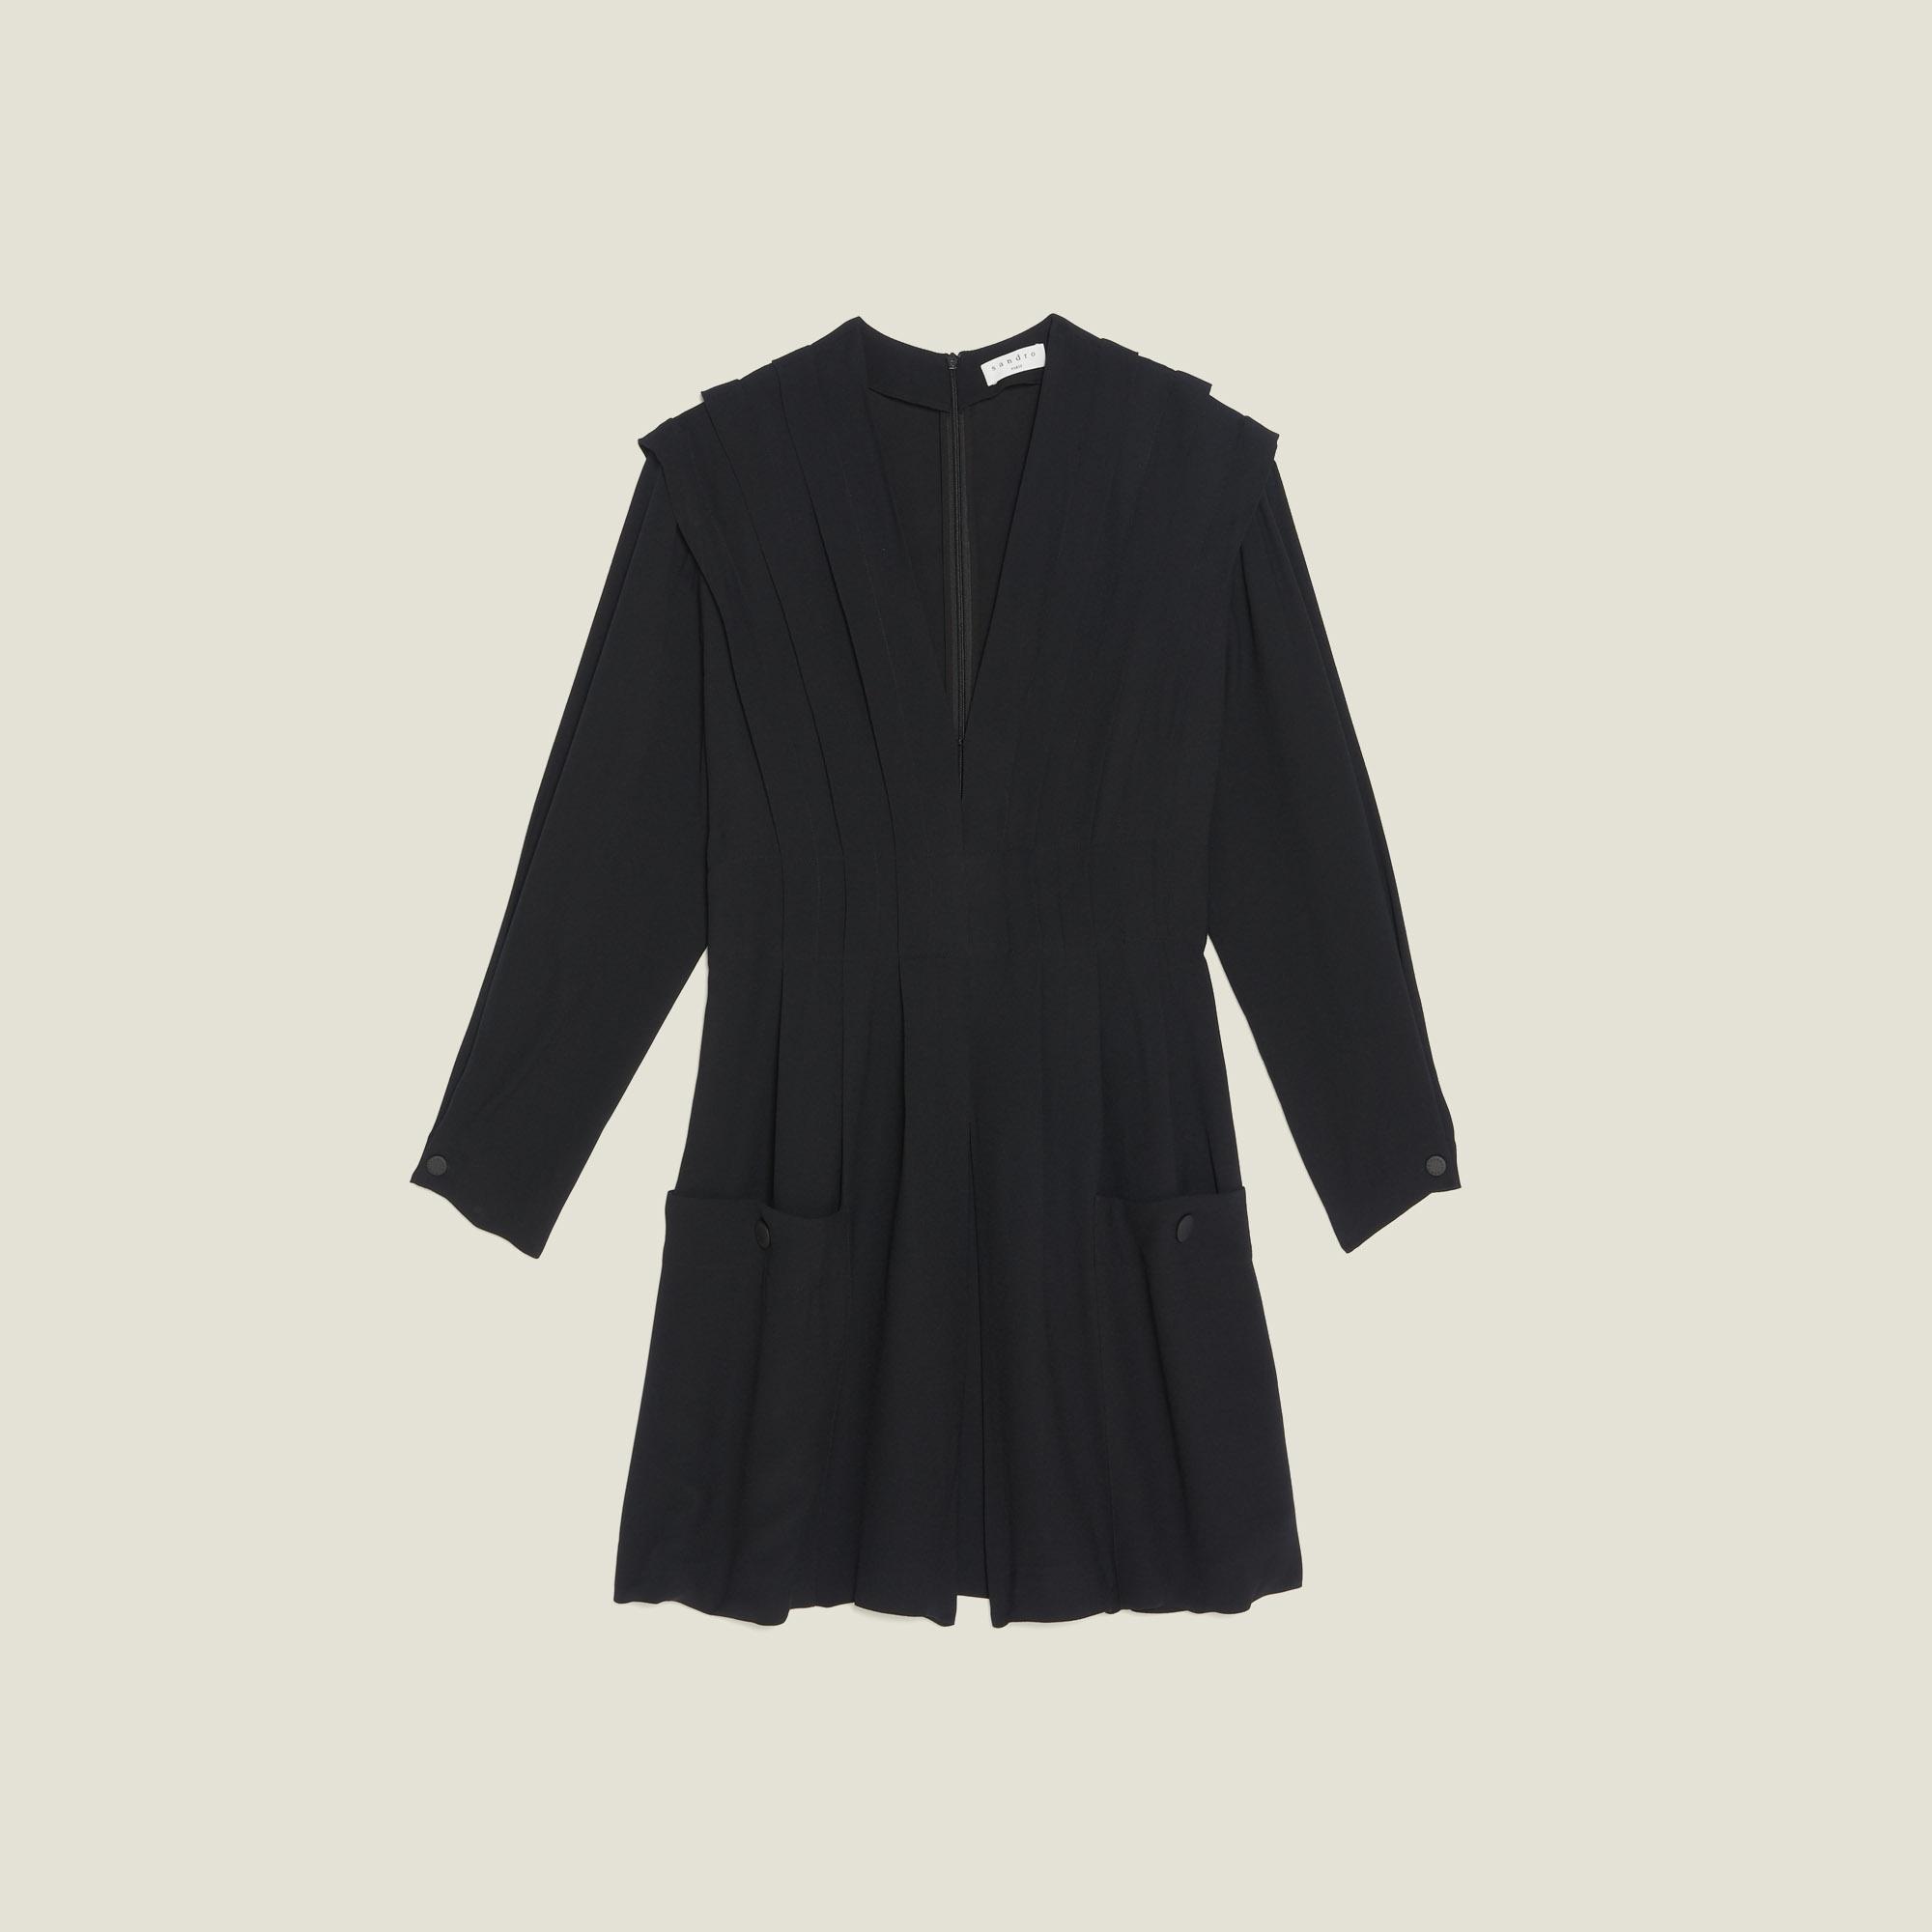 cfbd36ecb32d ... Short Flowing Dress With Pleats : Dresses color Black